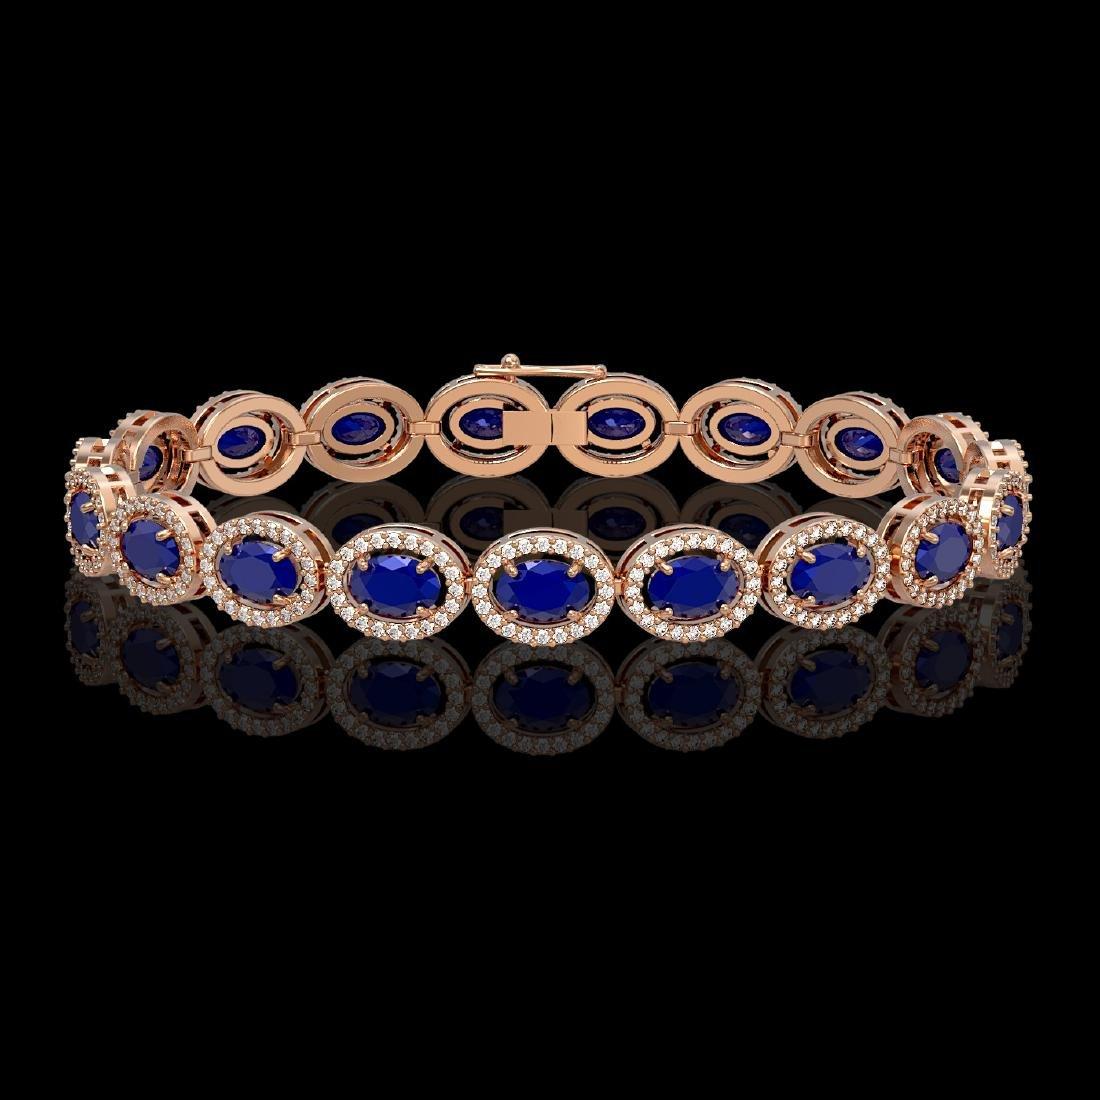 15.2 CTW Sapphire & Diamond Halo Bracelet 10K Rose Gold